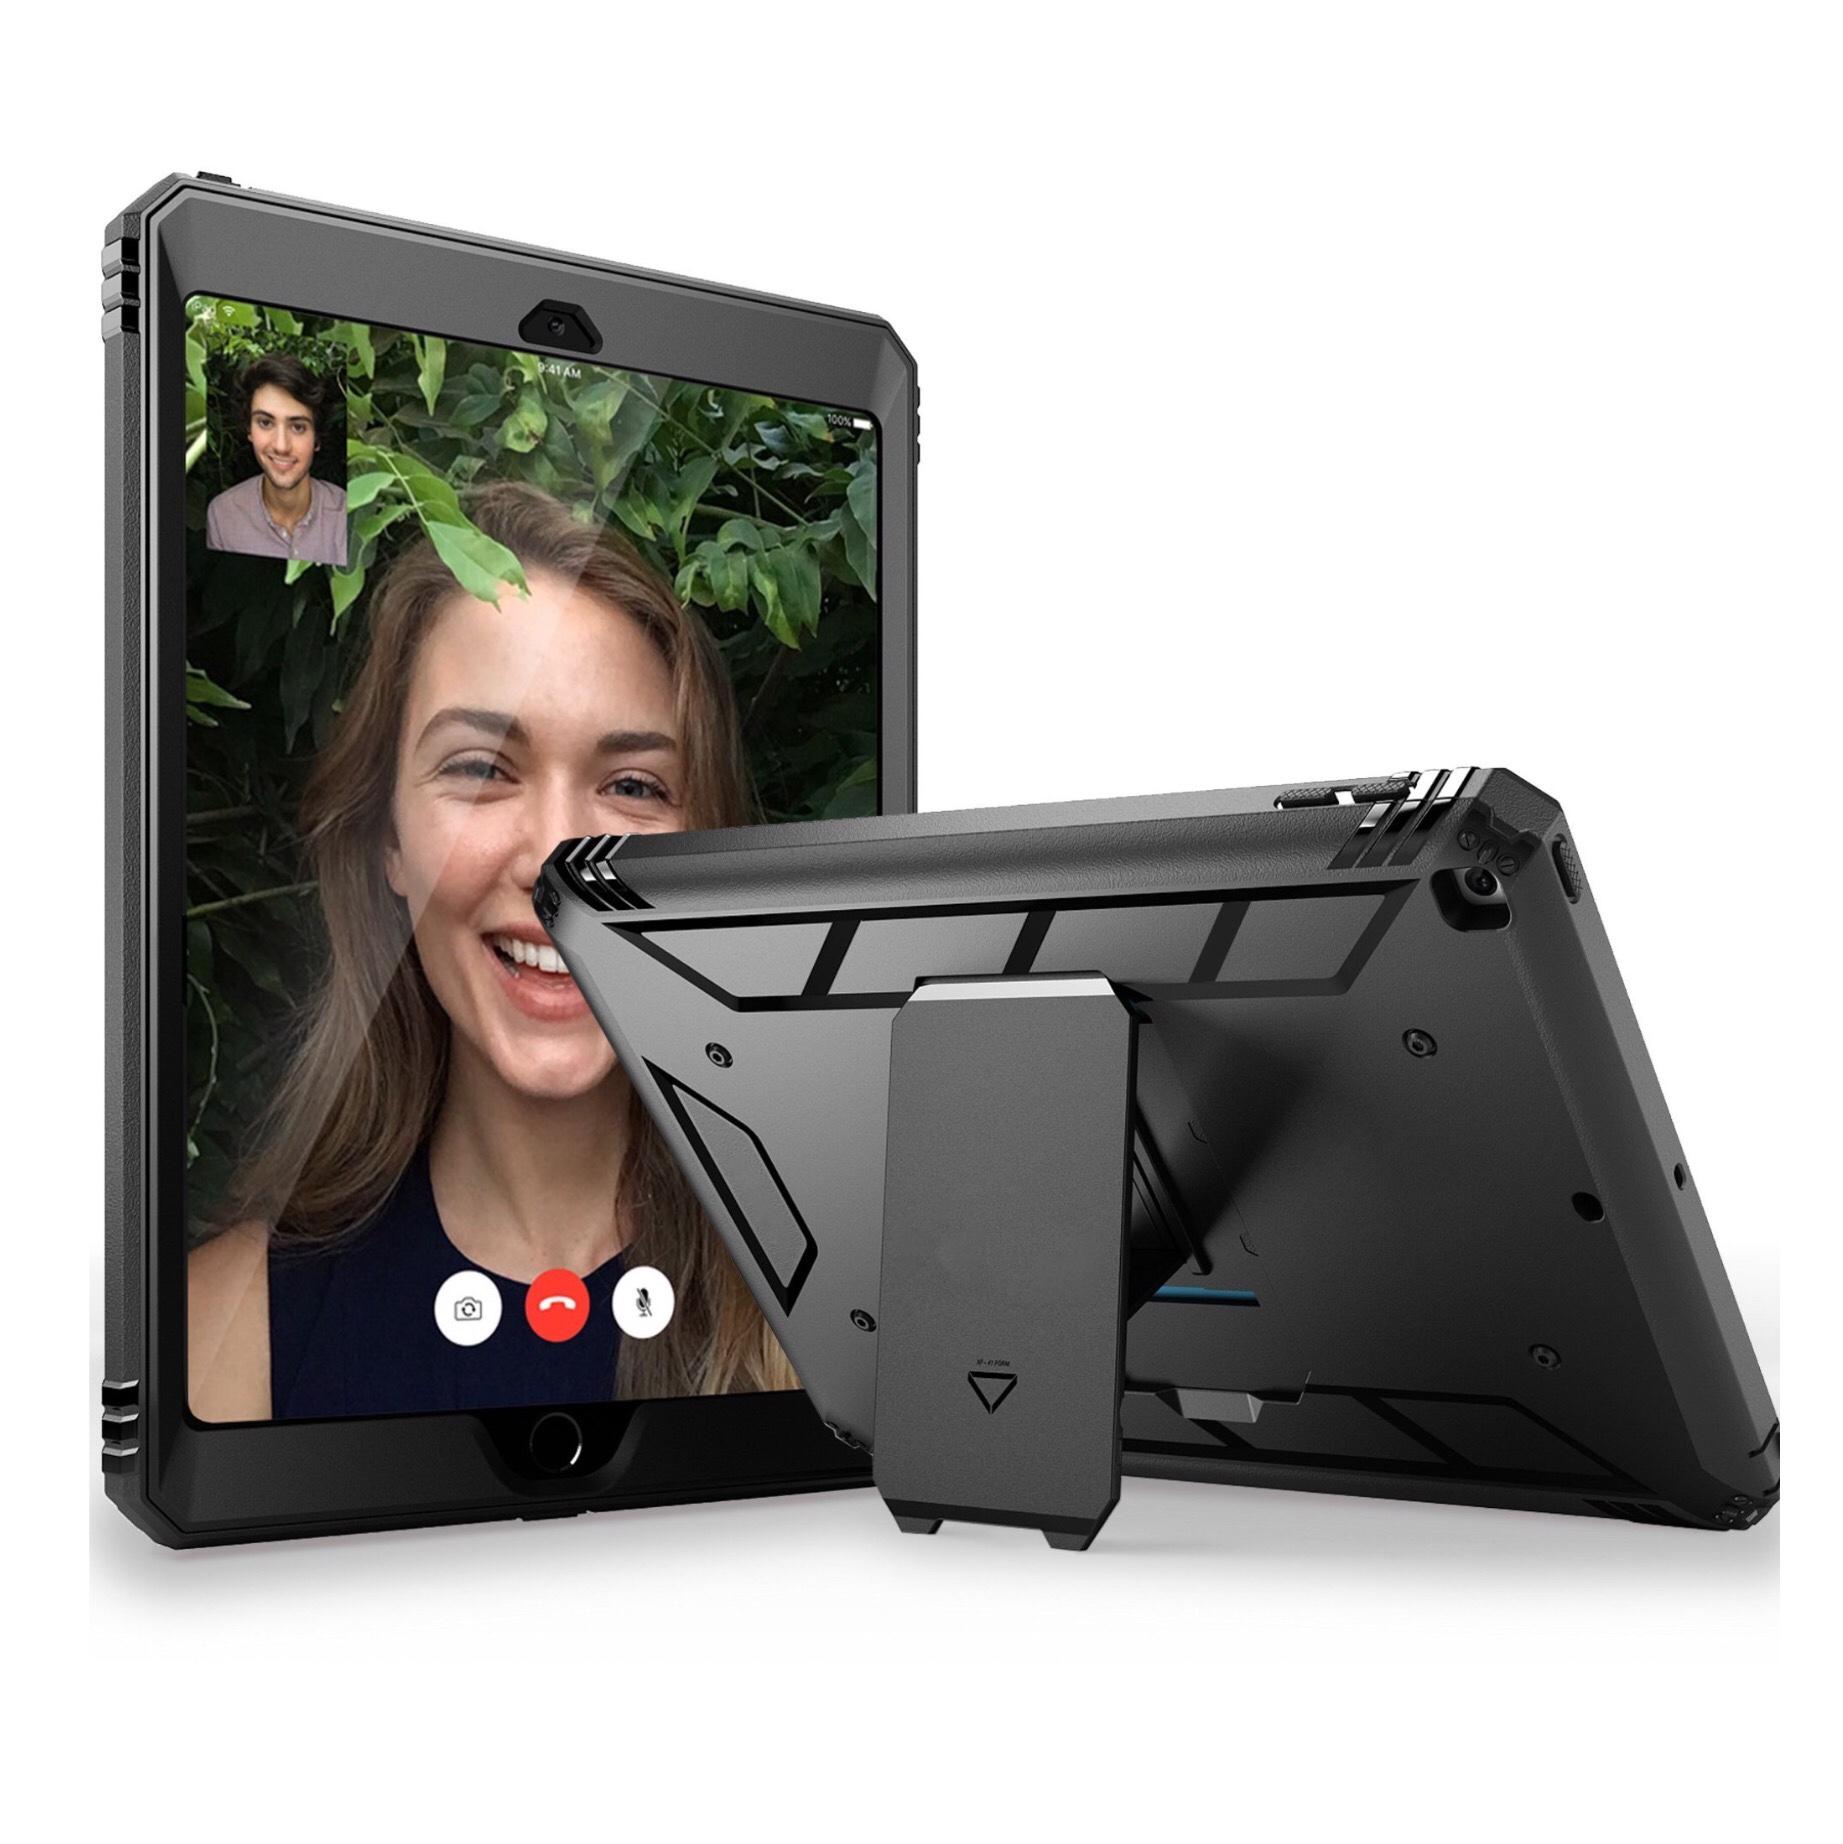 iPad 2017 Coque renforcee pied amovible et Film de protection ecran Footer